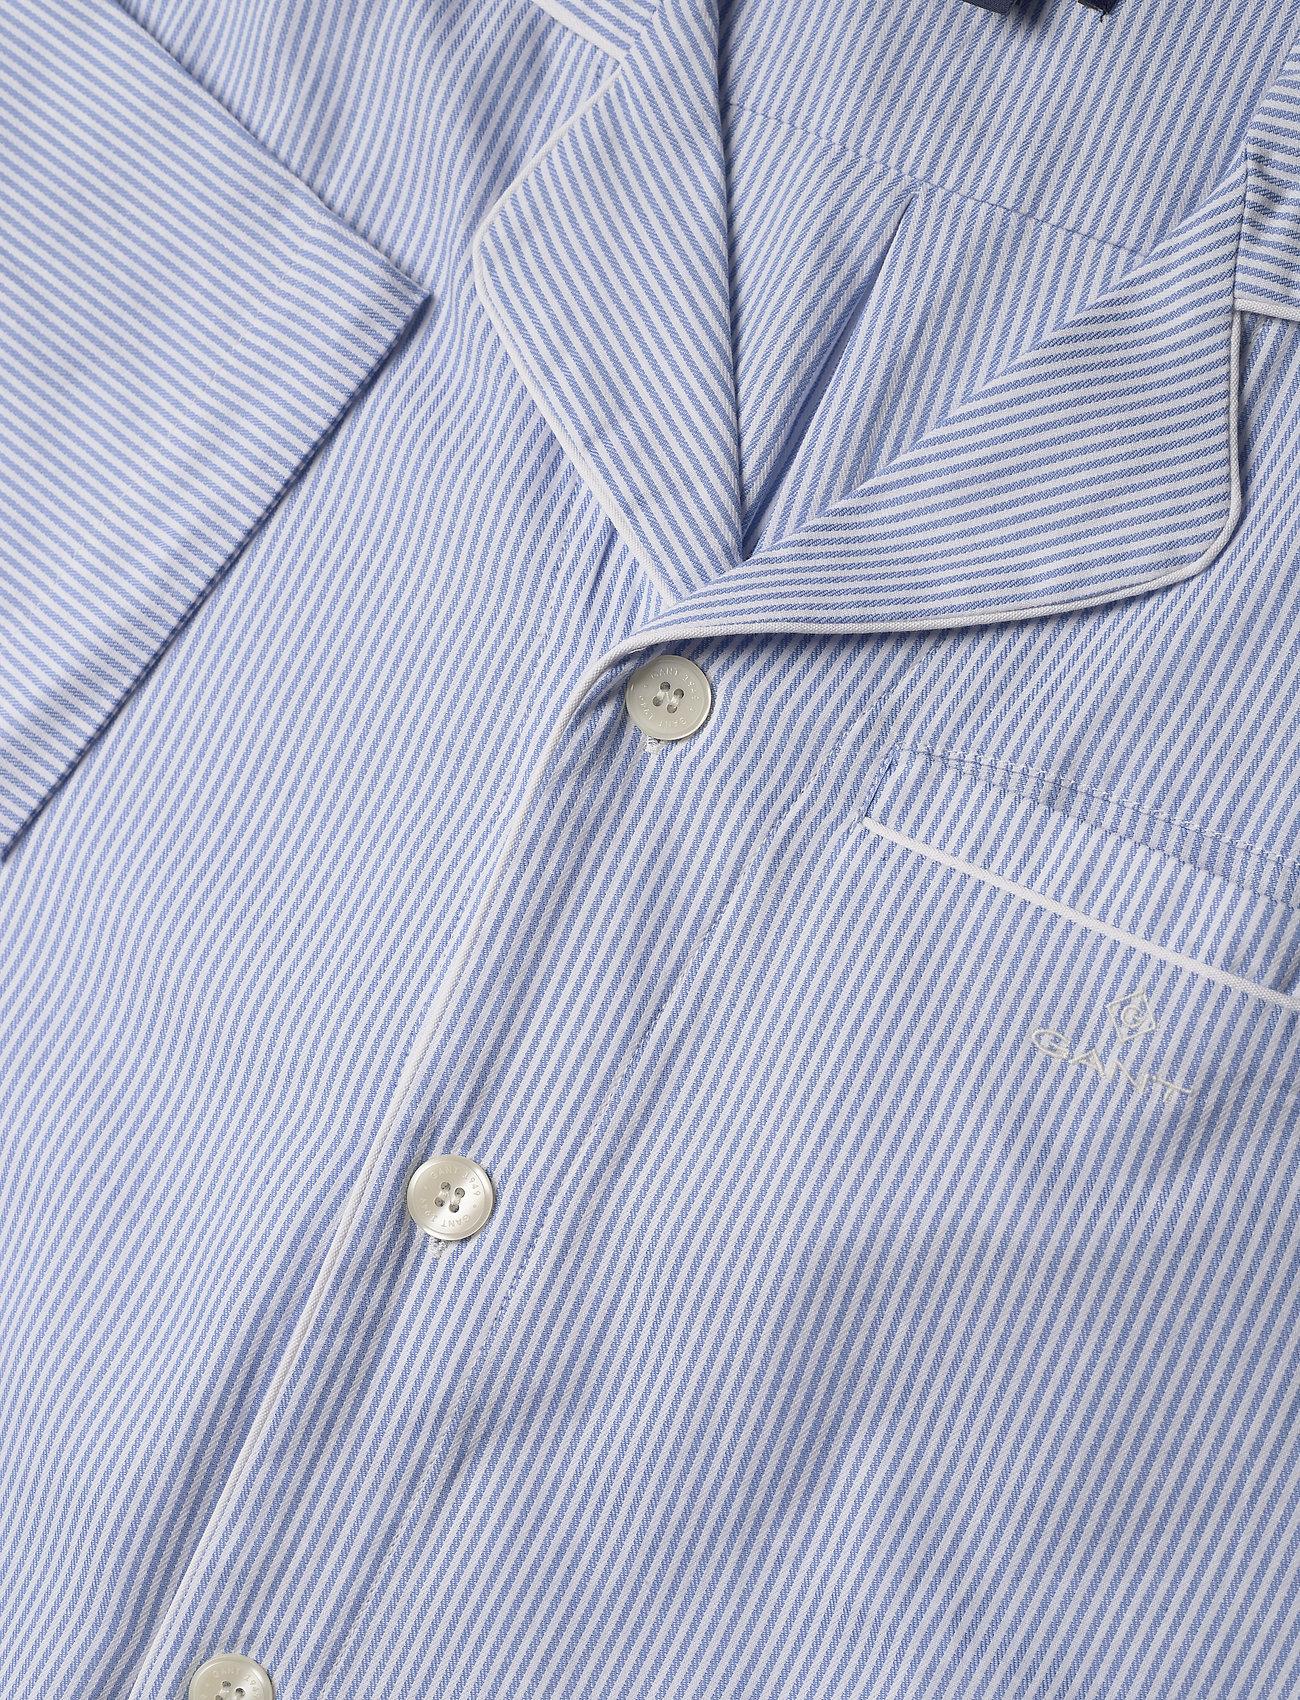 Gant Pajama Set Shirt Classic Stripe - Sov- & Loungeplagg White